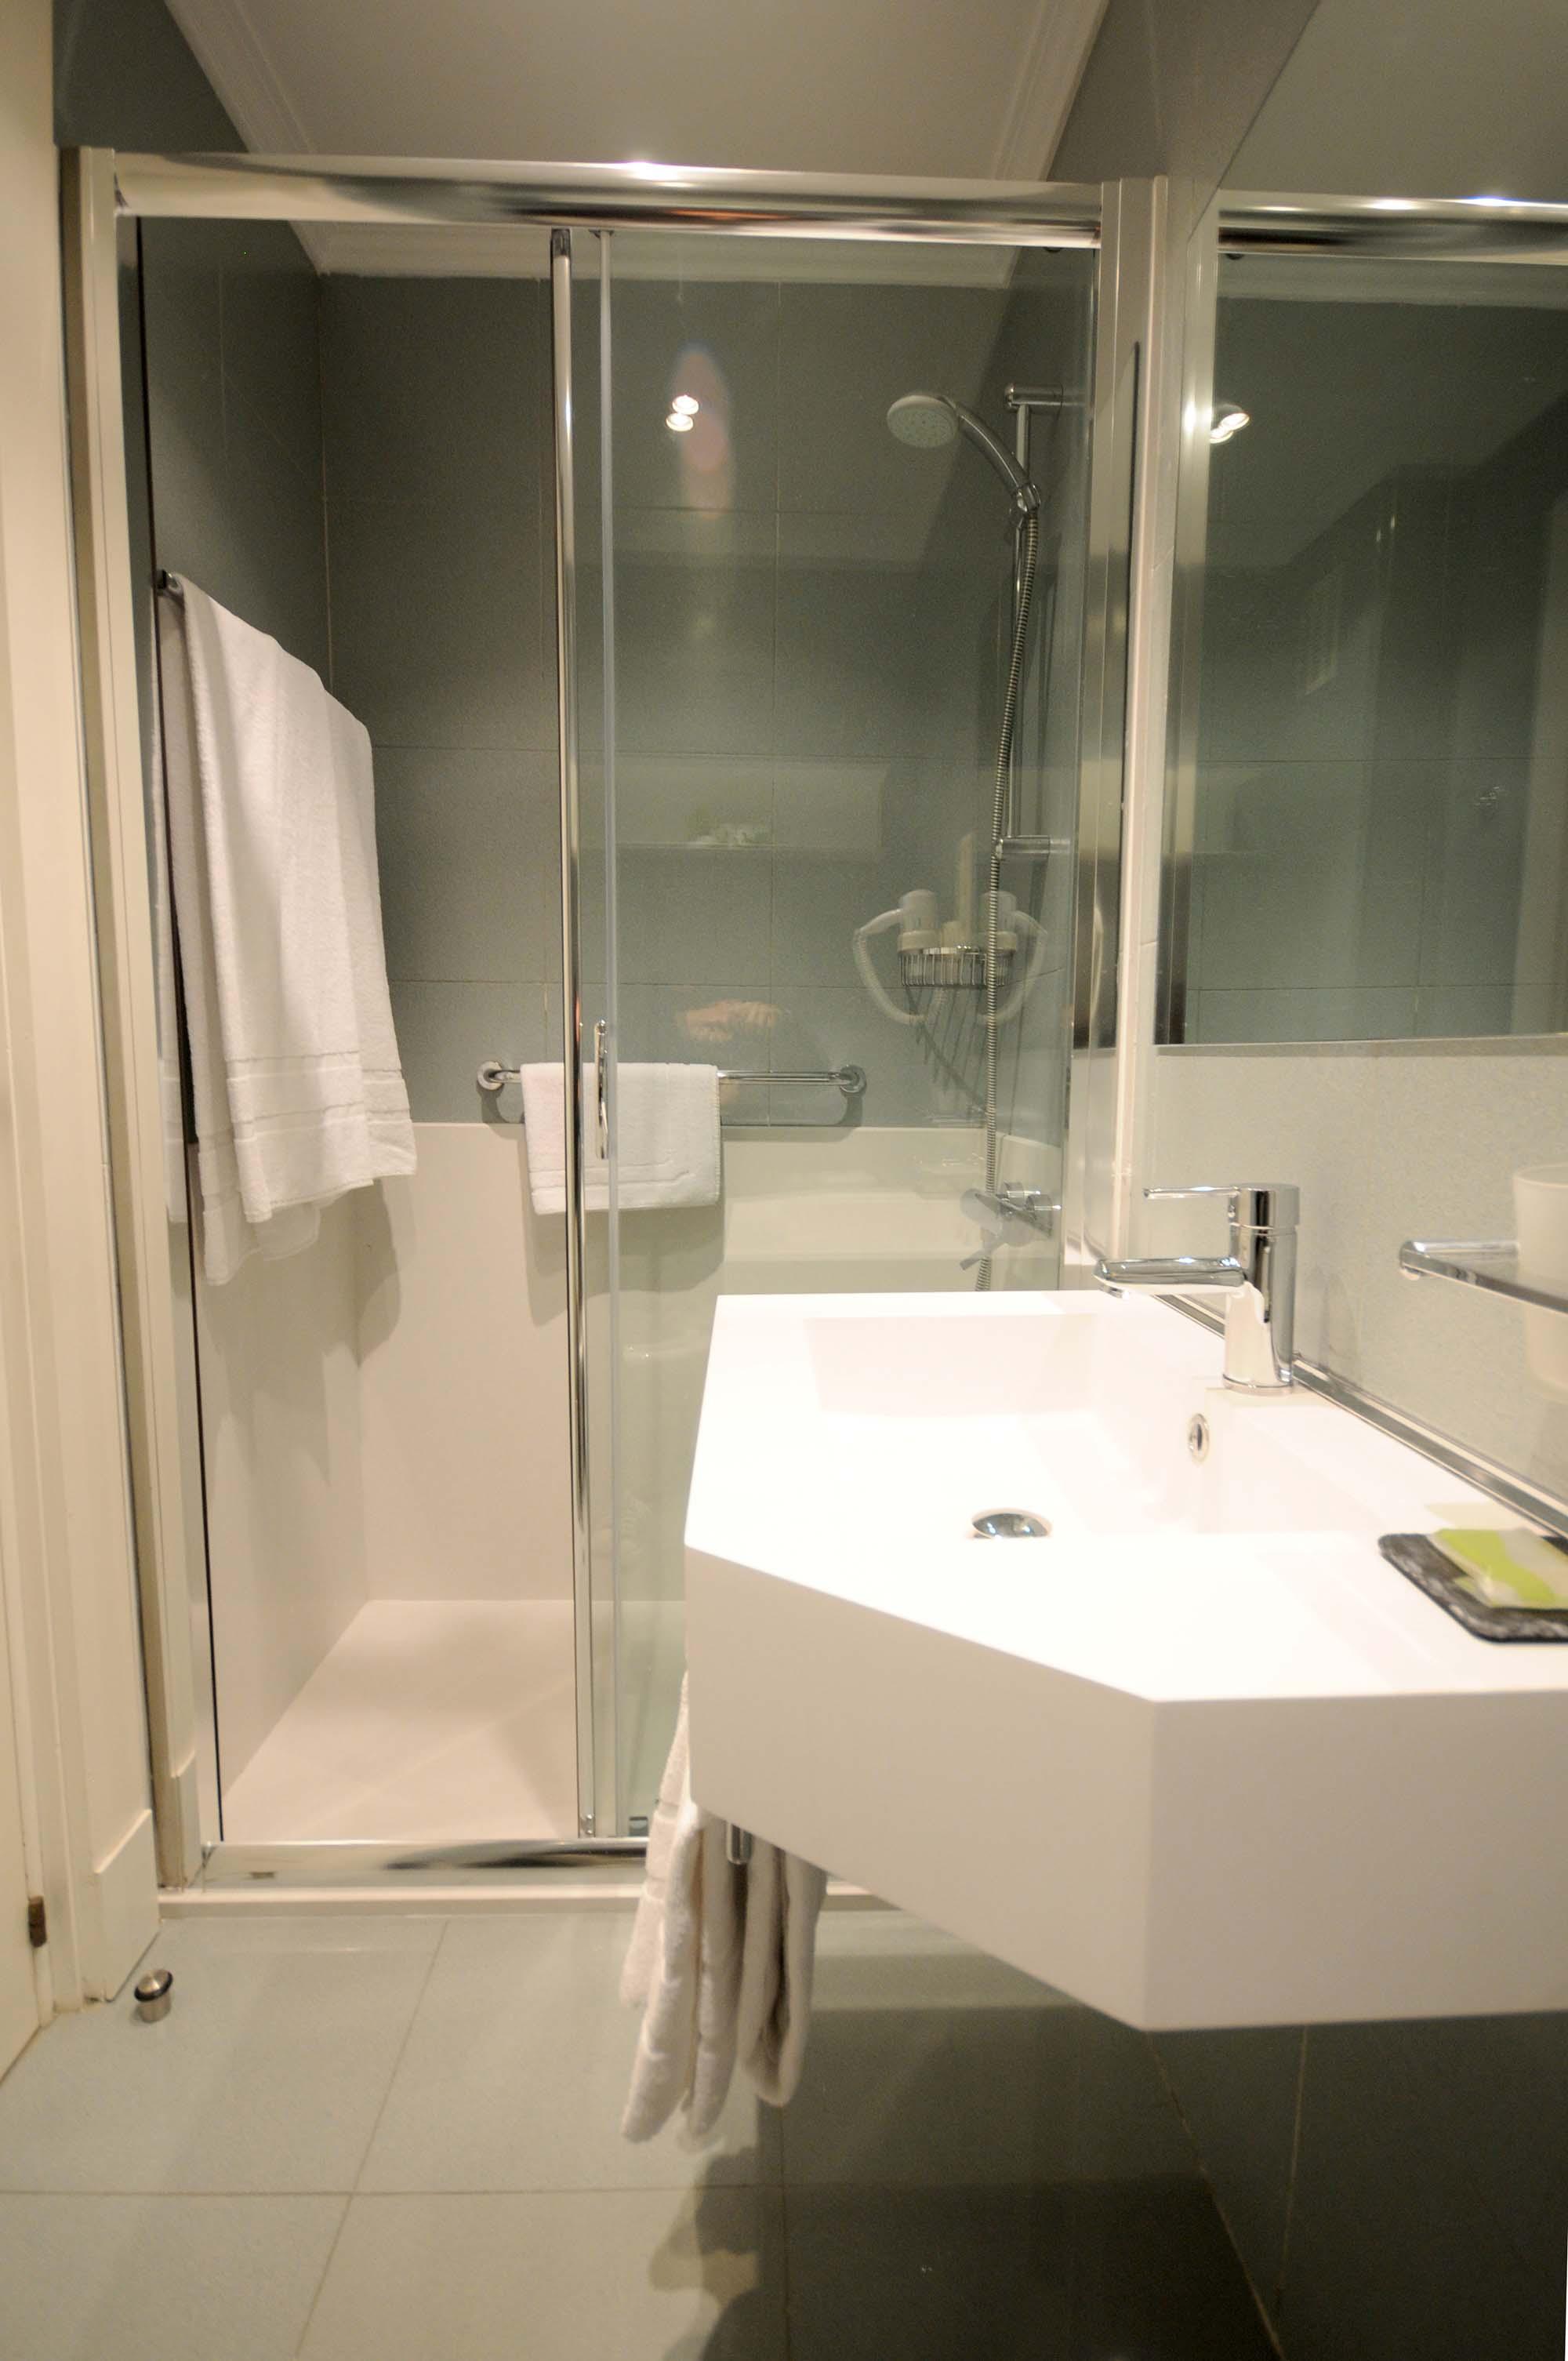 Cambio Bañera por Ducha de DuchaYa en Donosti Hotel Niza 6